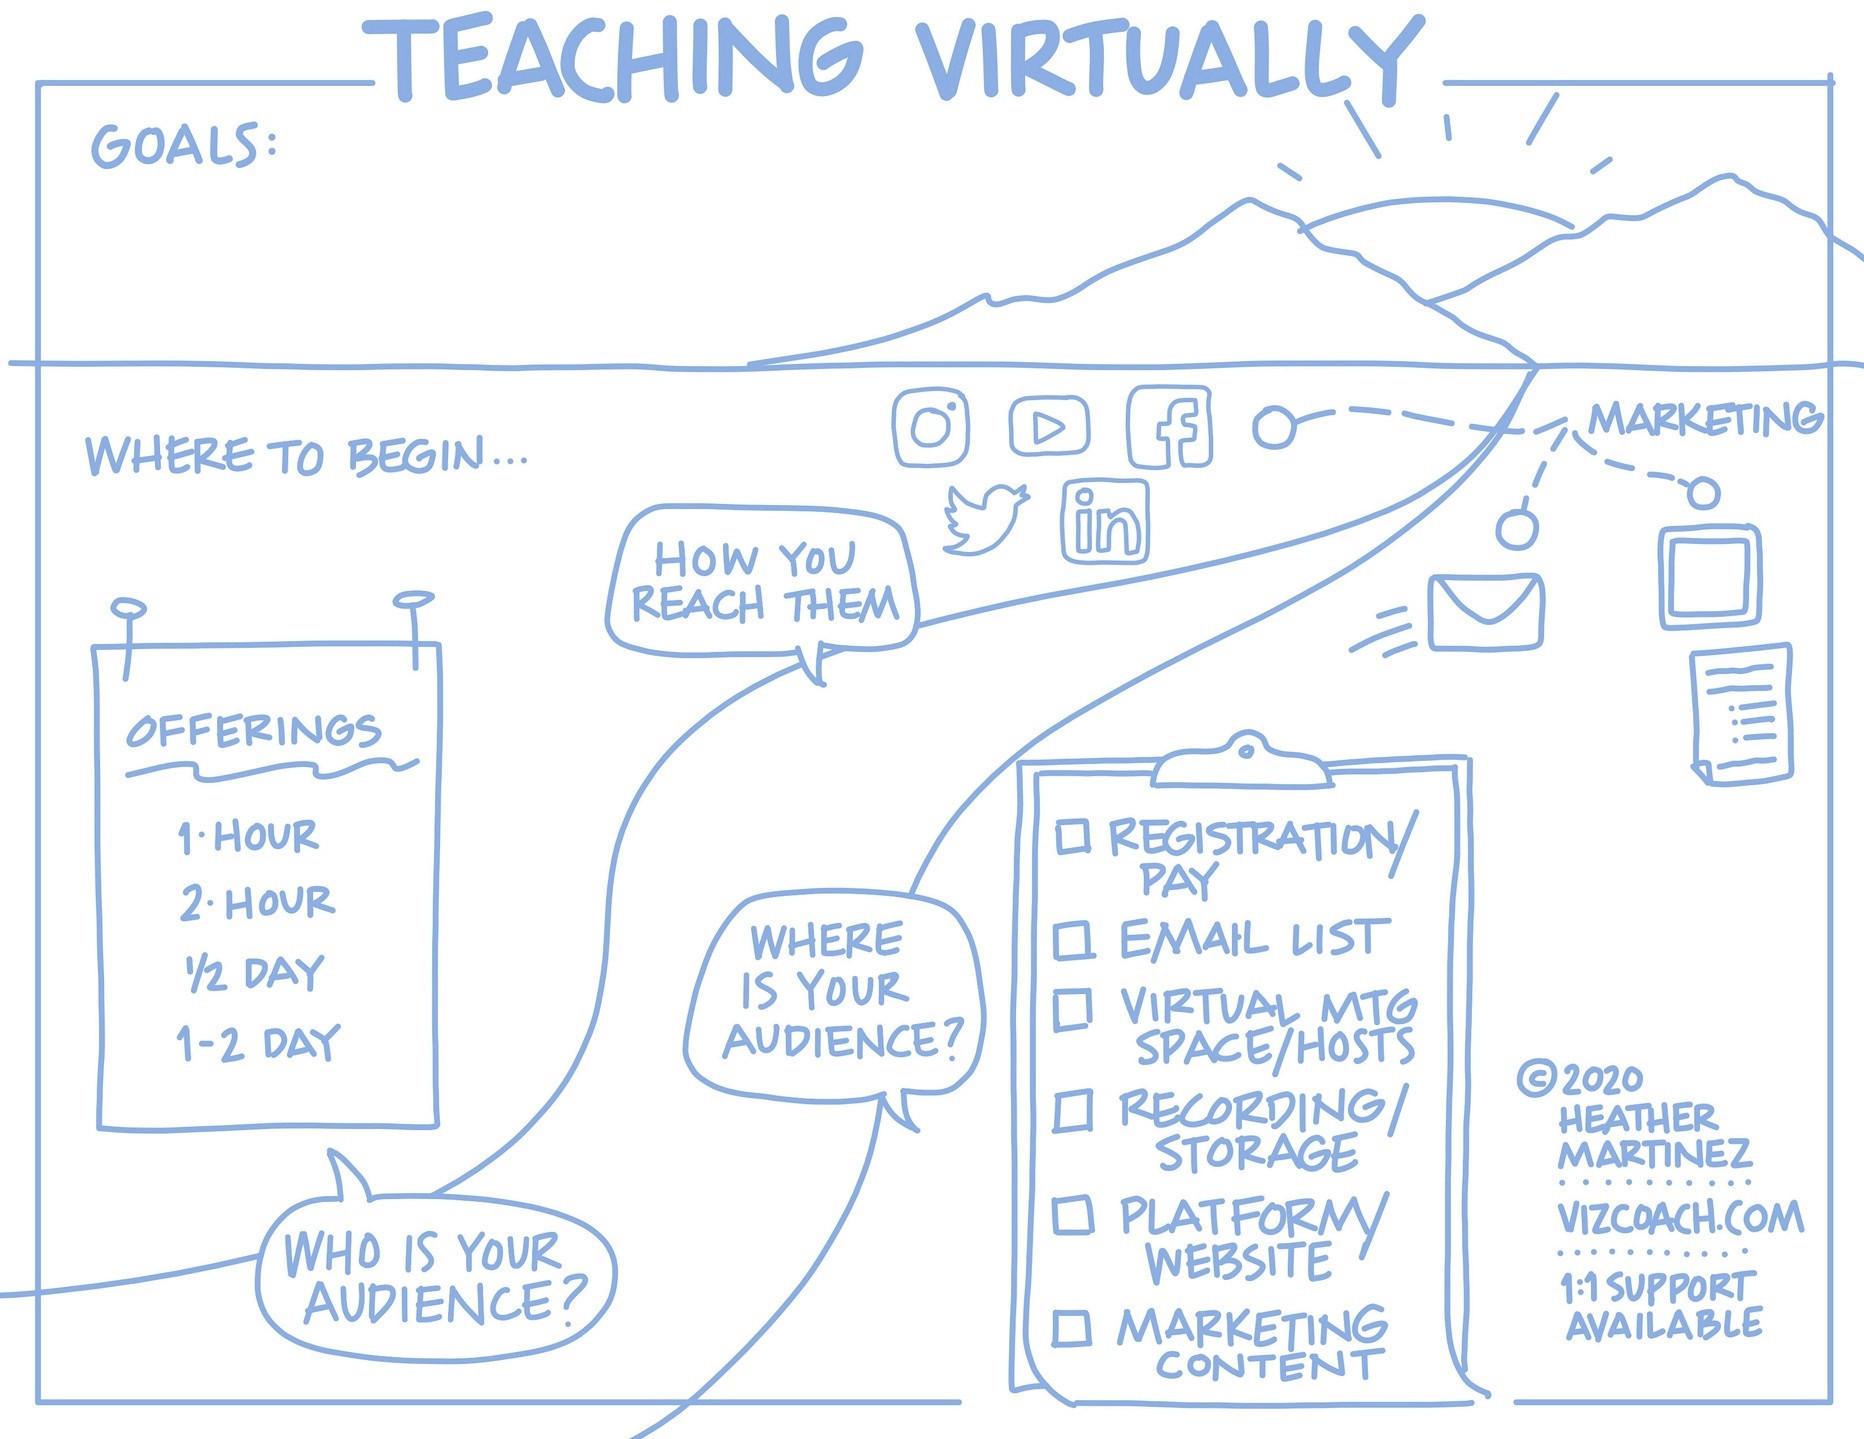 Teaching virtually Roadmap